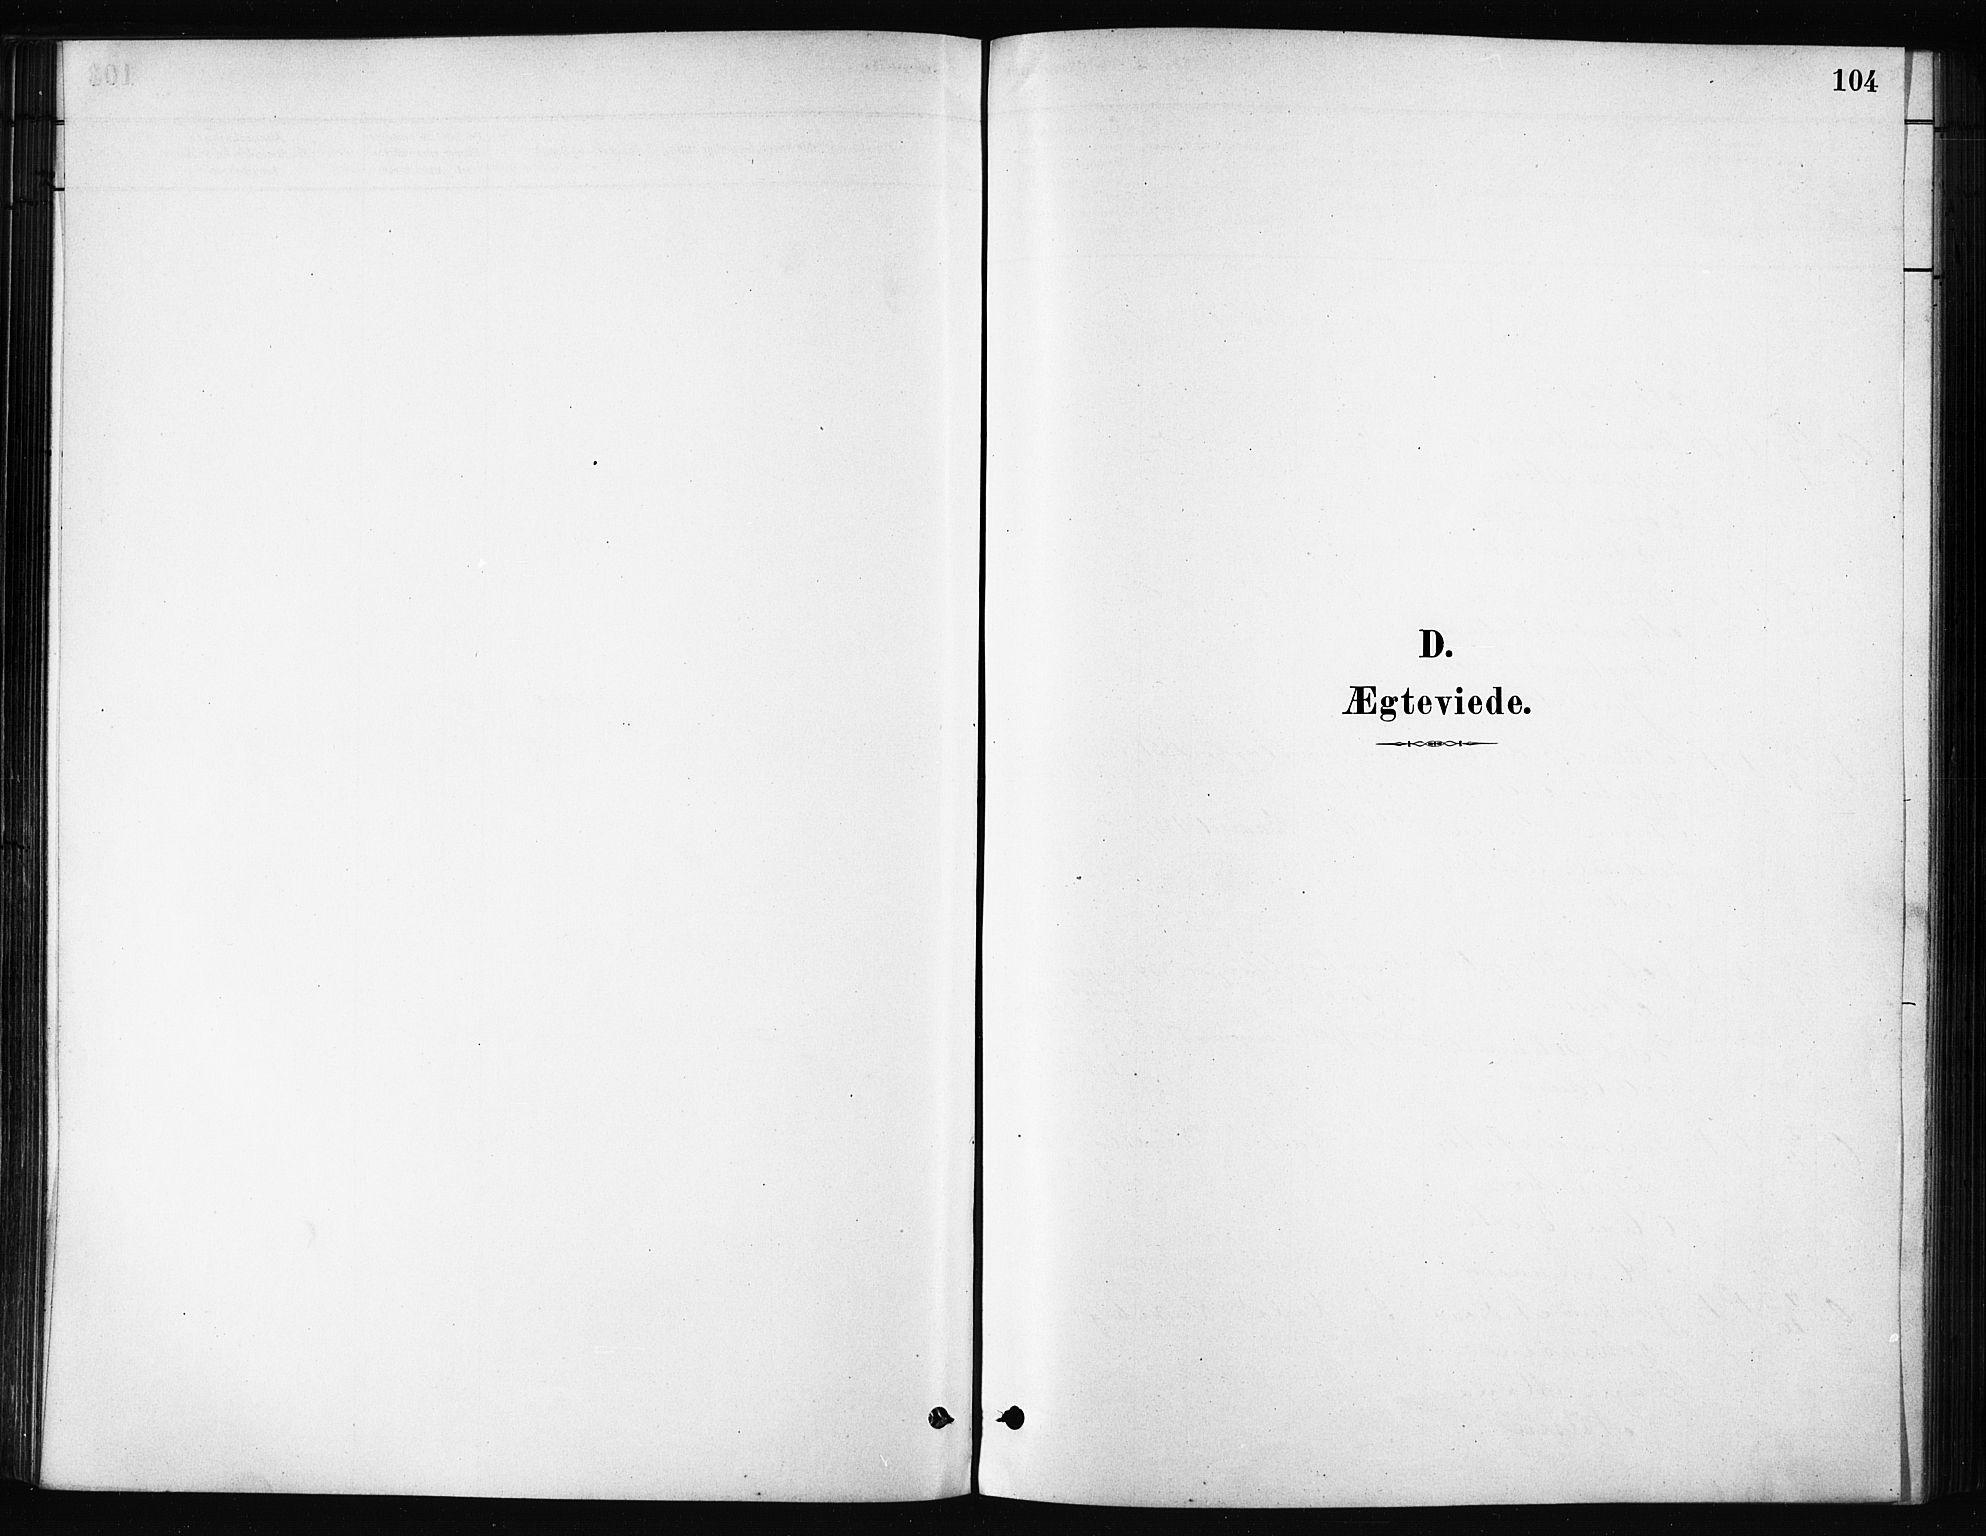 SATØ, Karlsøy sokneprestembete, H/Ha/Haa/L0011kirke: Parish register (official) no. 11, 1879-1892, p. 104